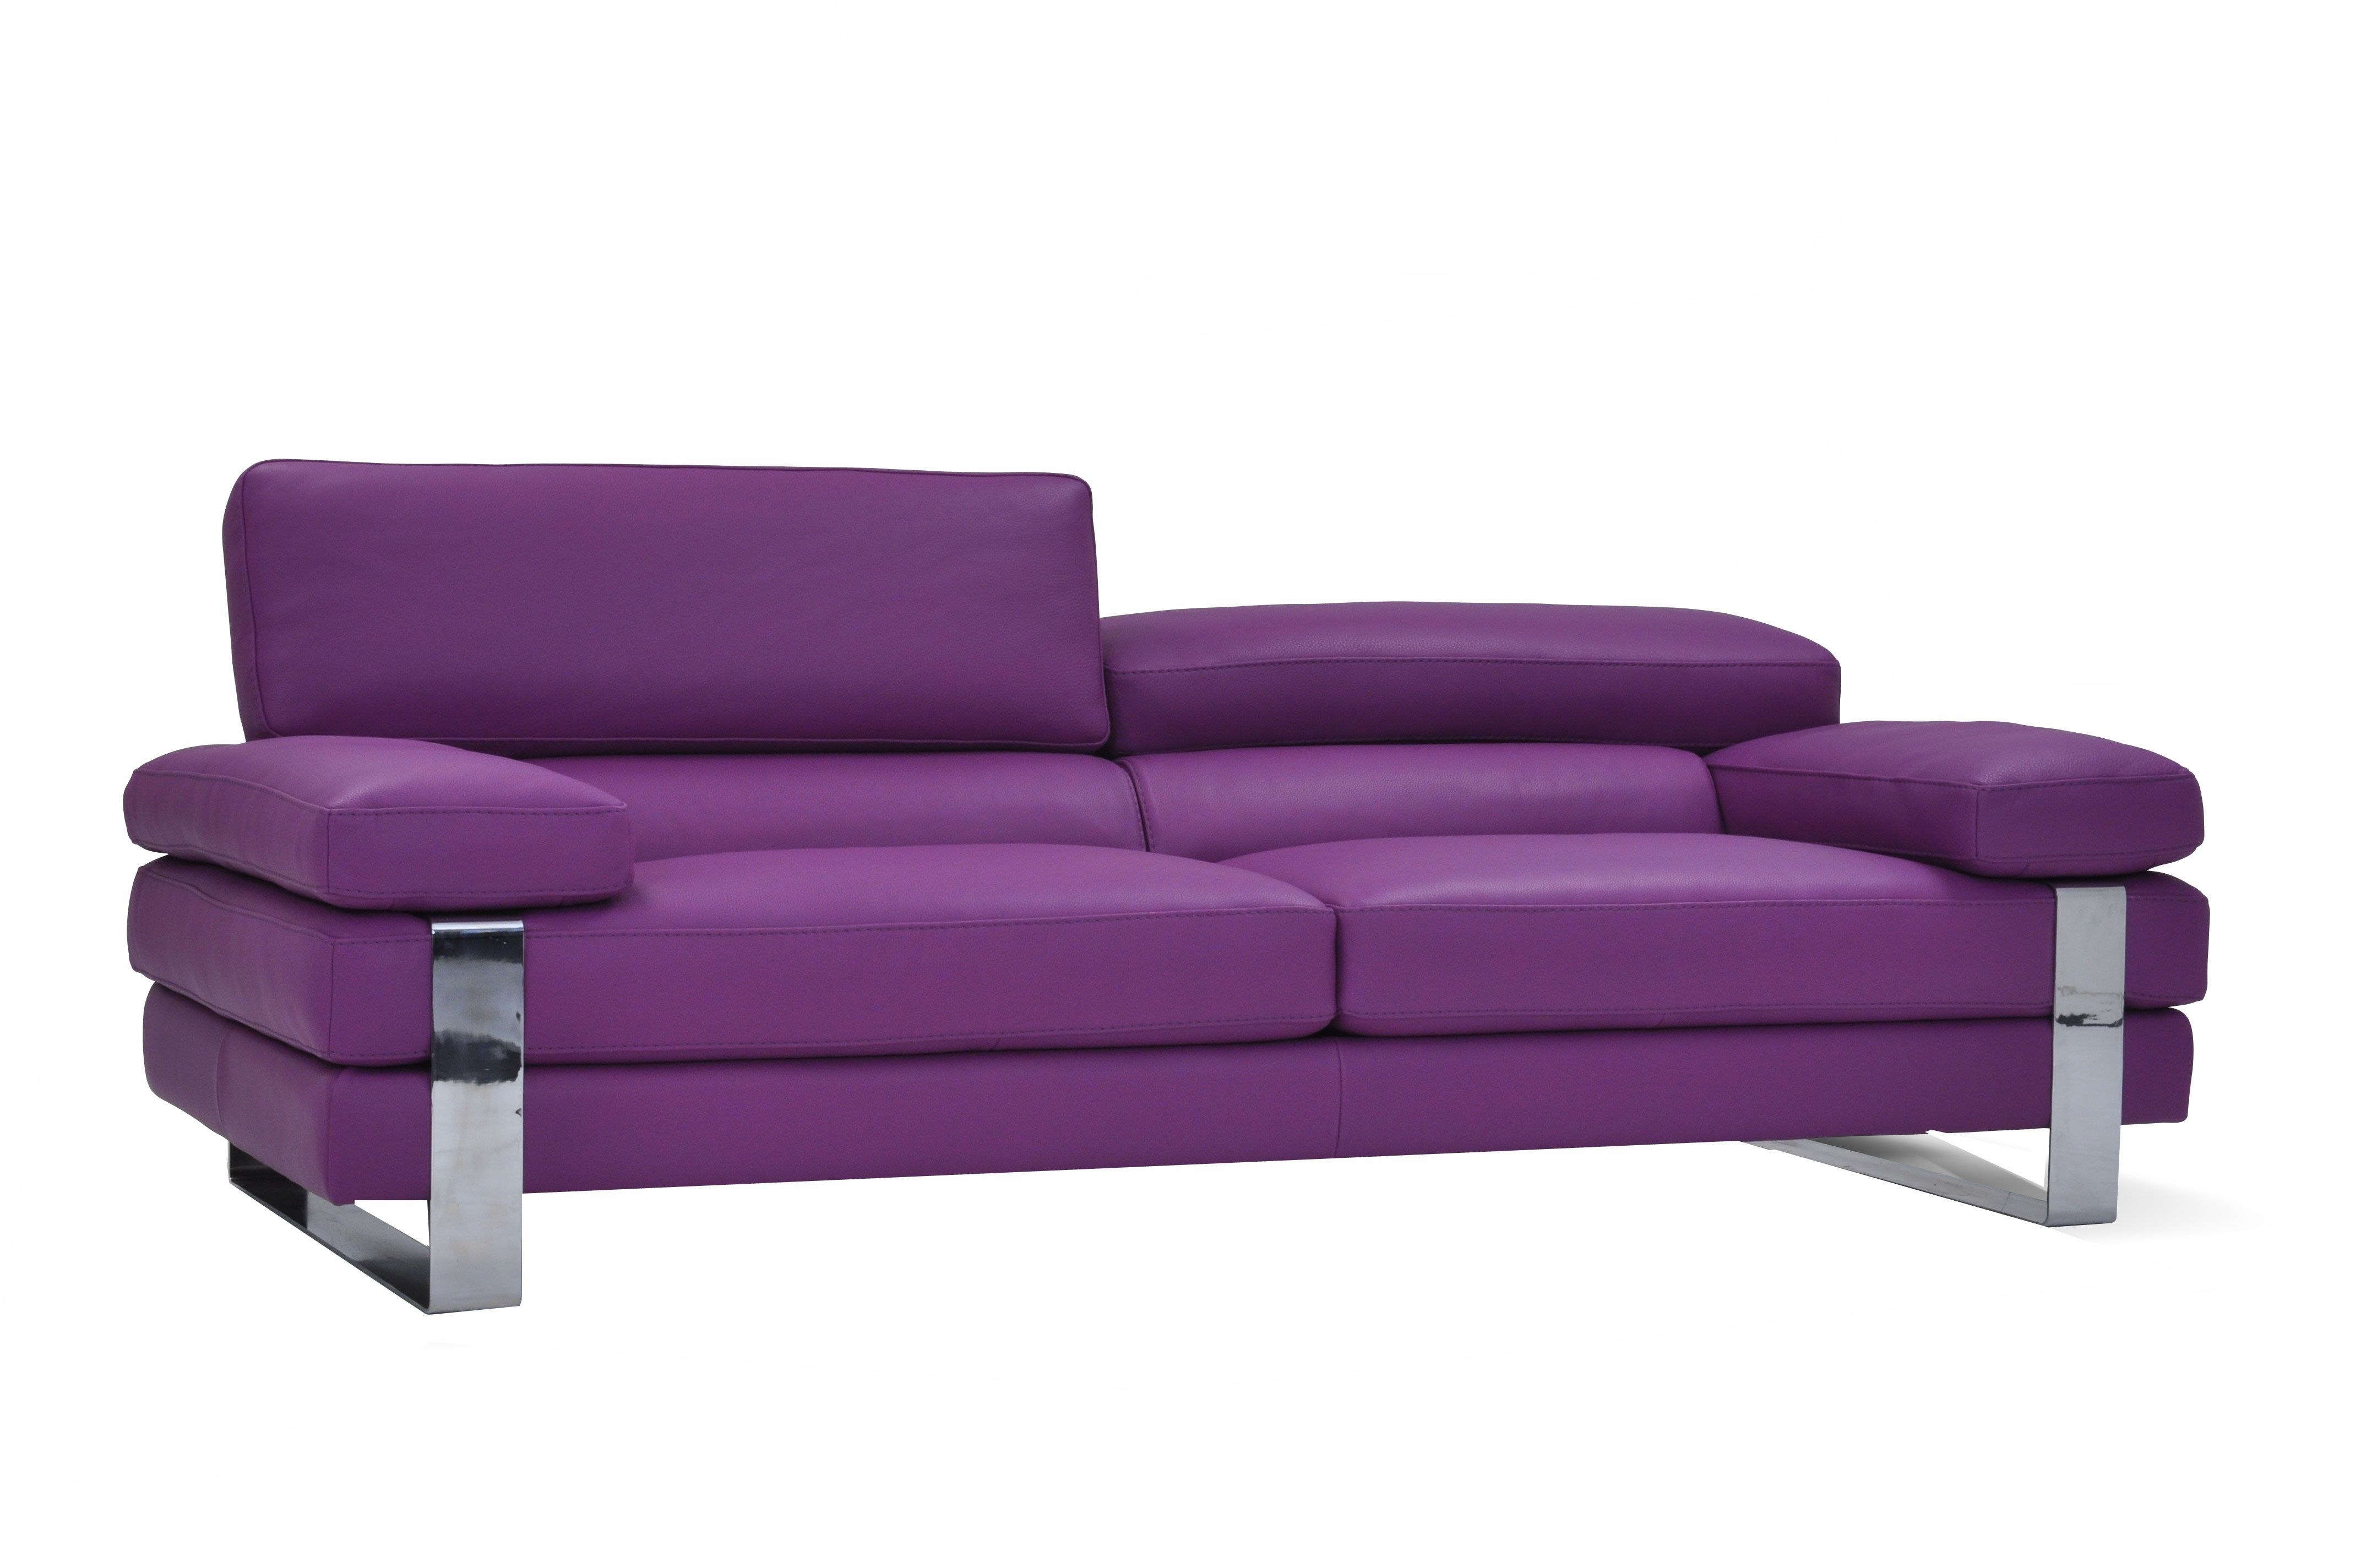 Purple Leather Sofa Made in Italy @ Furniture Toronto ...